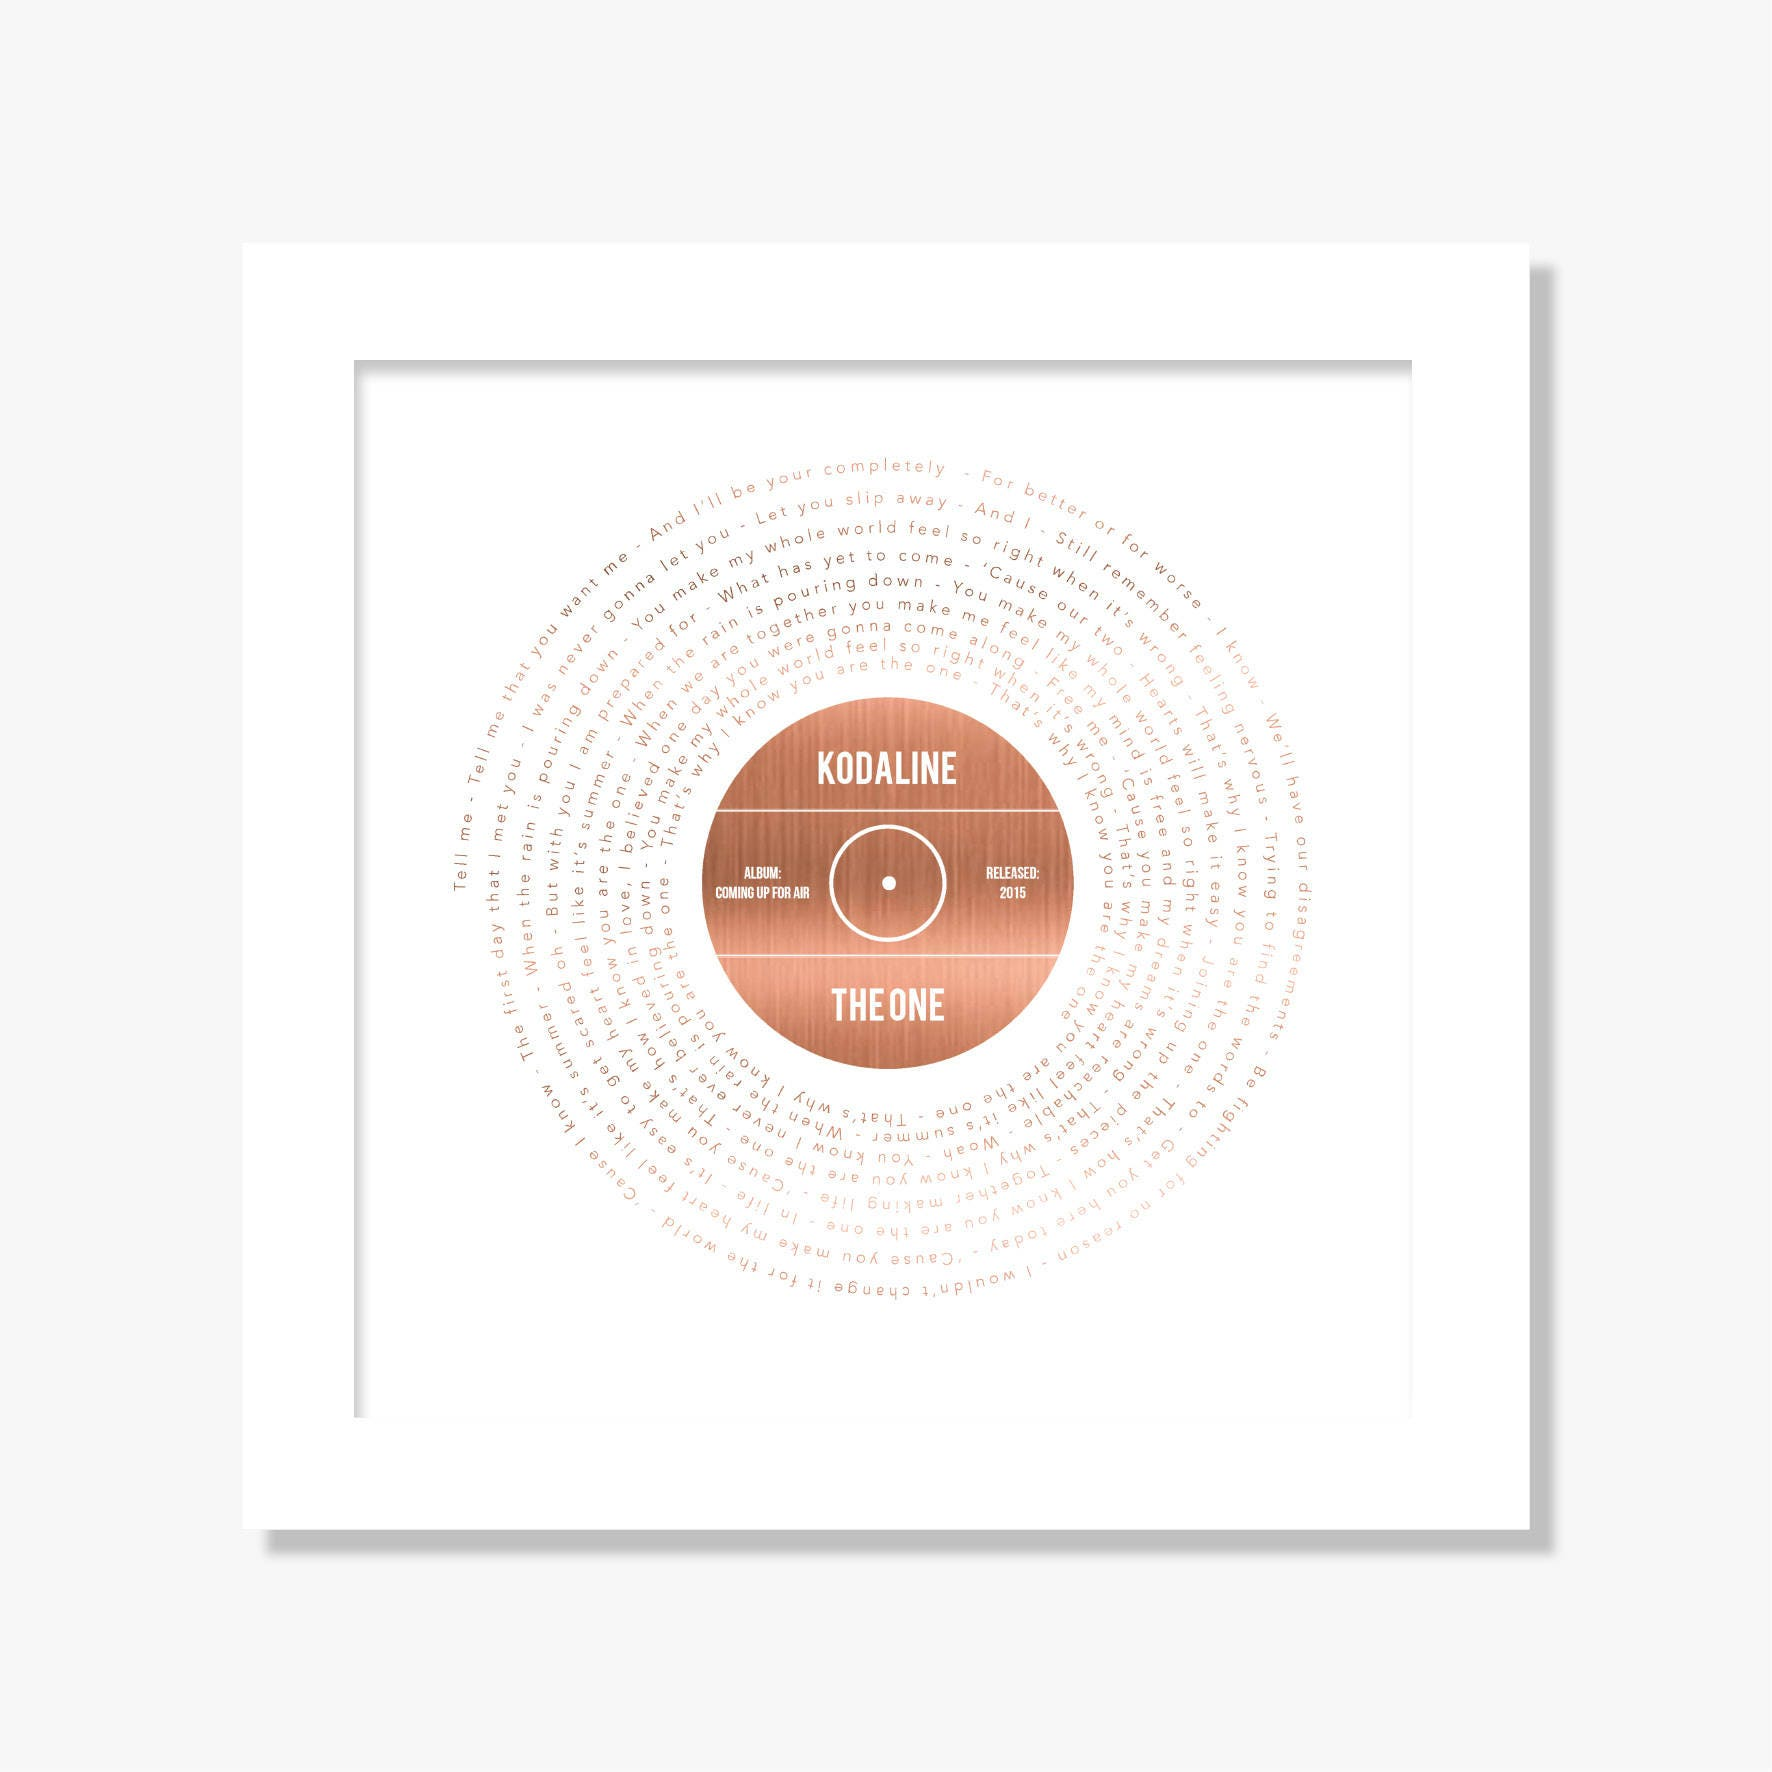 Personalisierte Folie gedruckt Lieblingslied songtexte Druck | Etsy